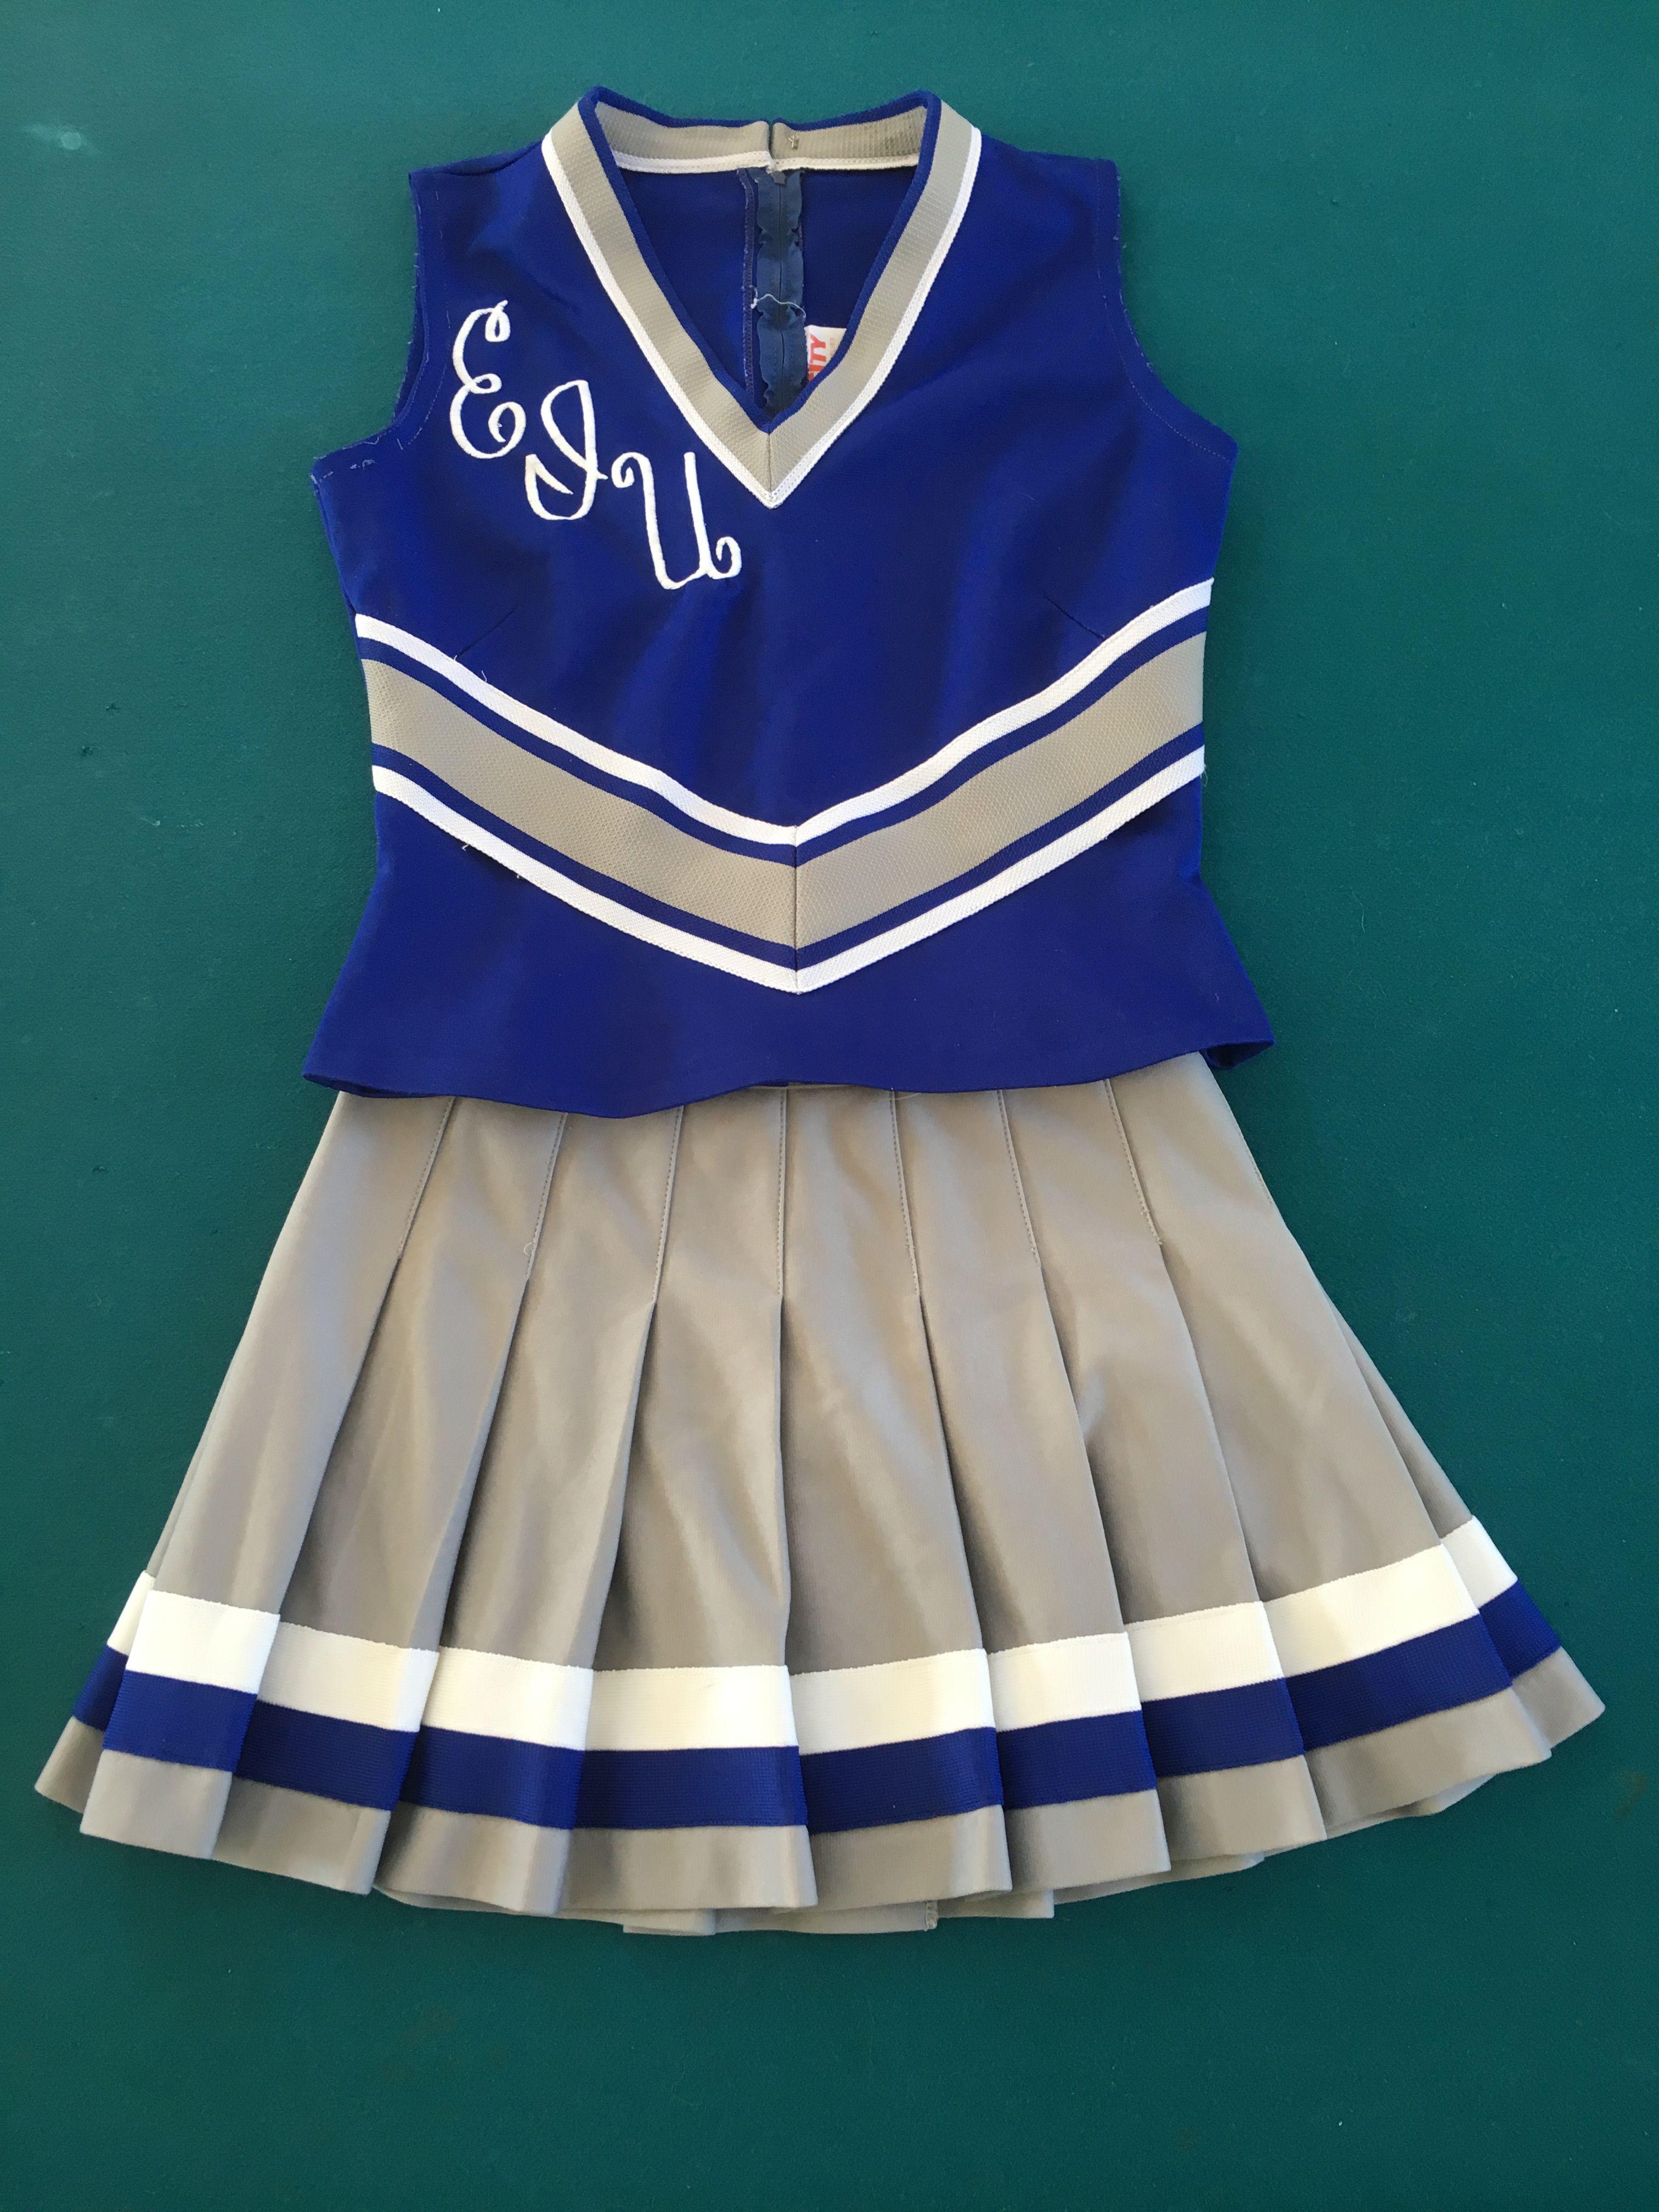 9a0dfe983c8 Vintage 80 s EIU cheerleader uniform by Varsity